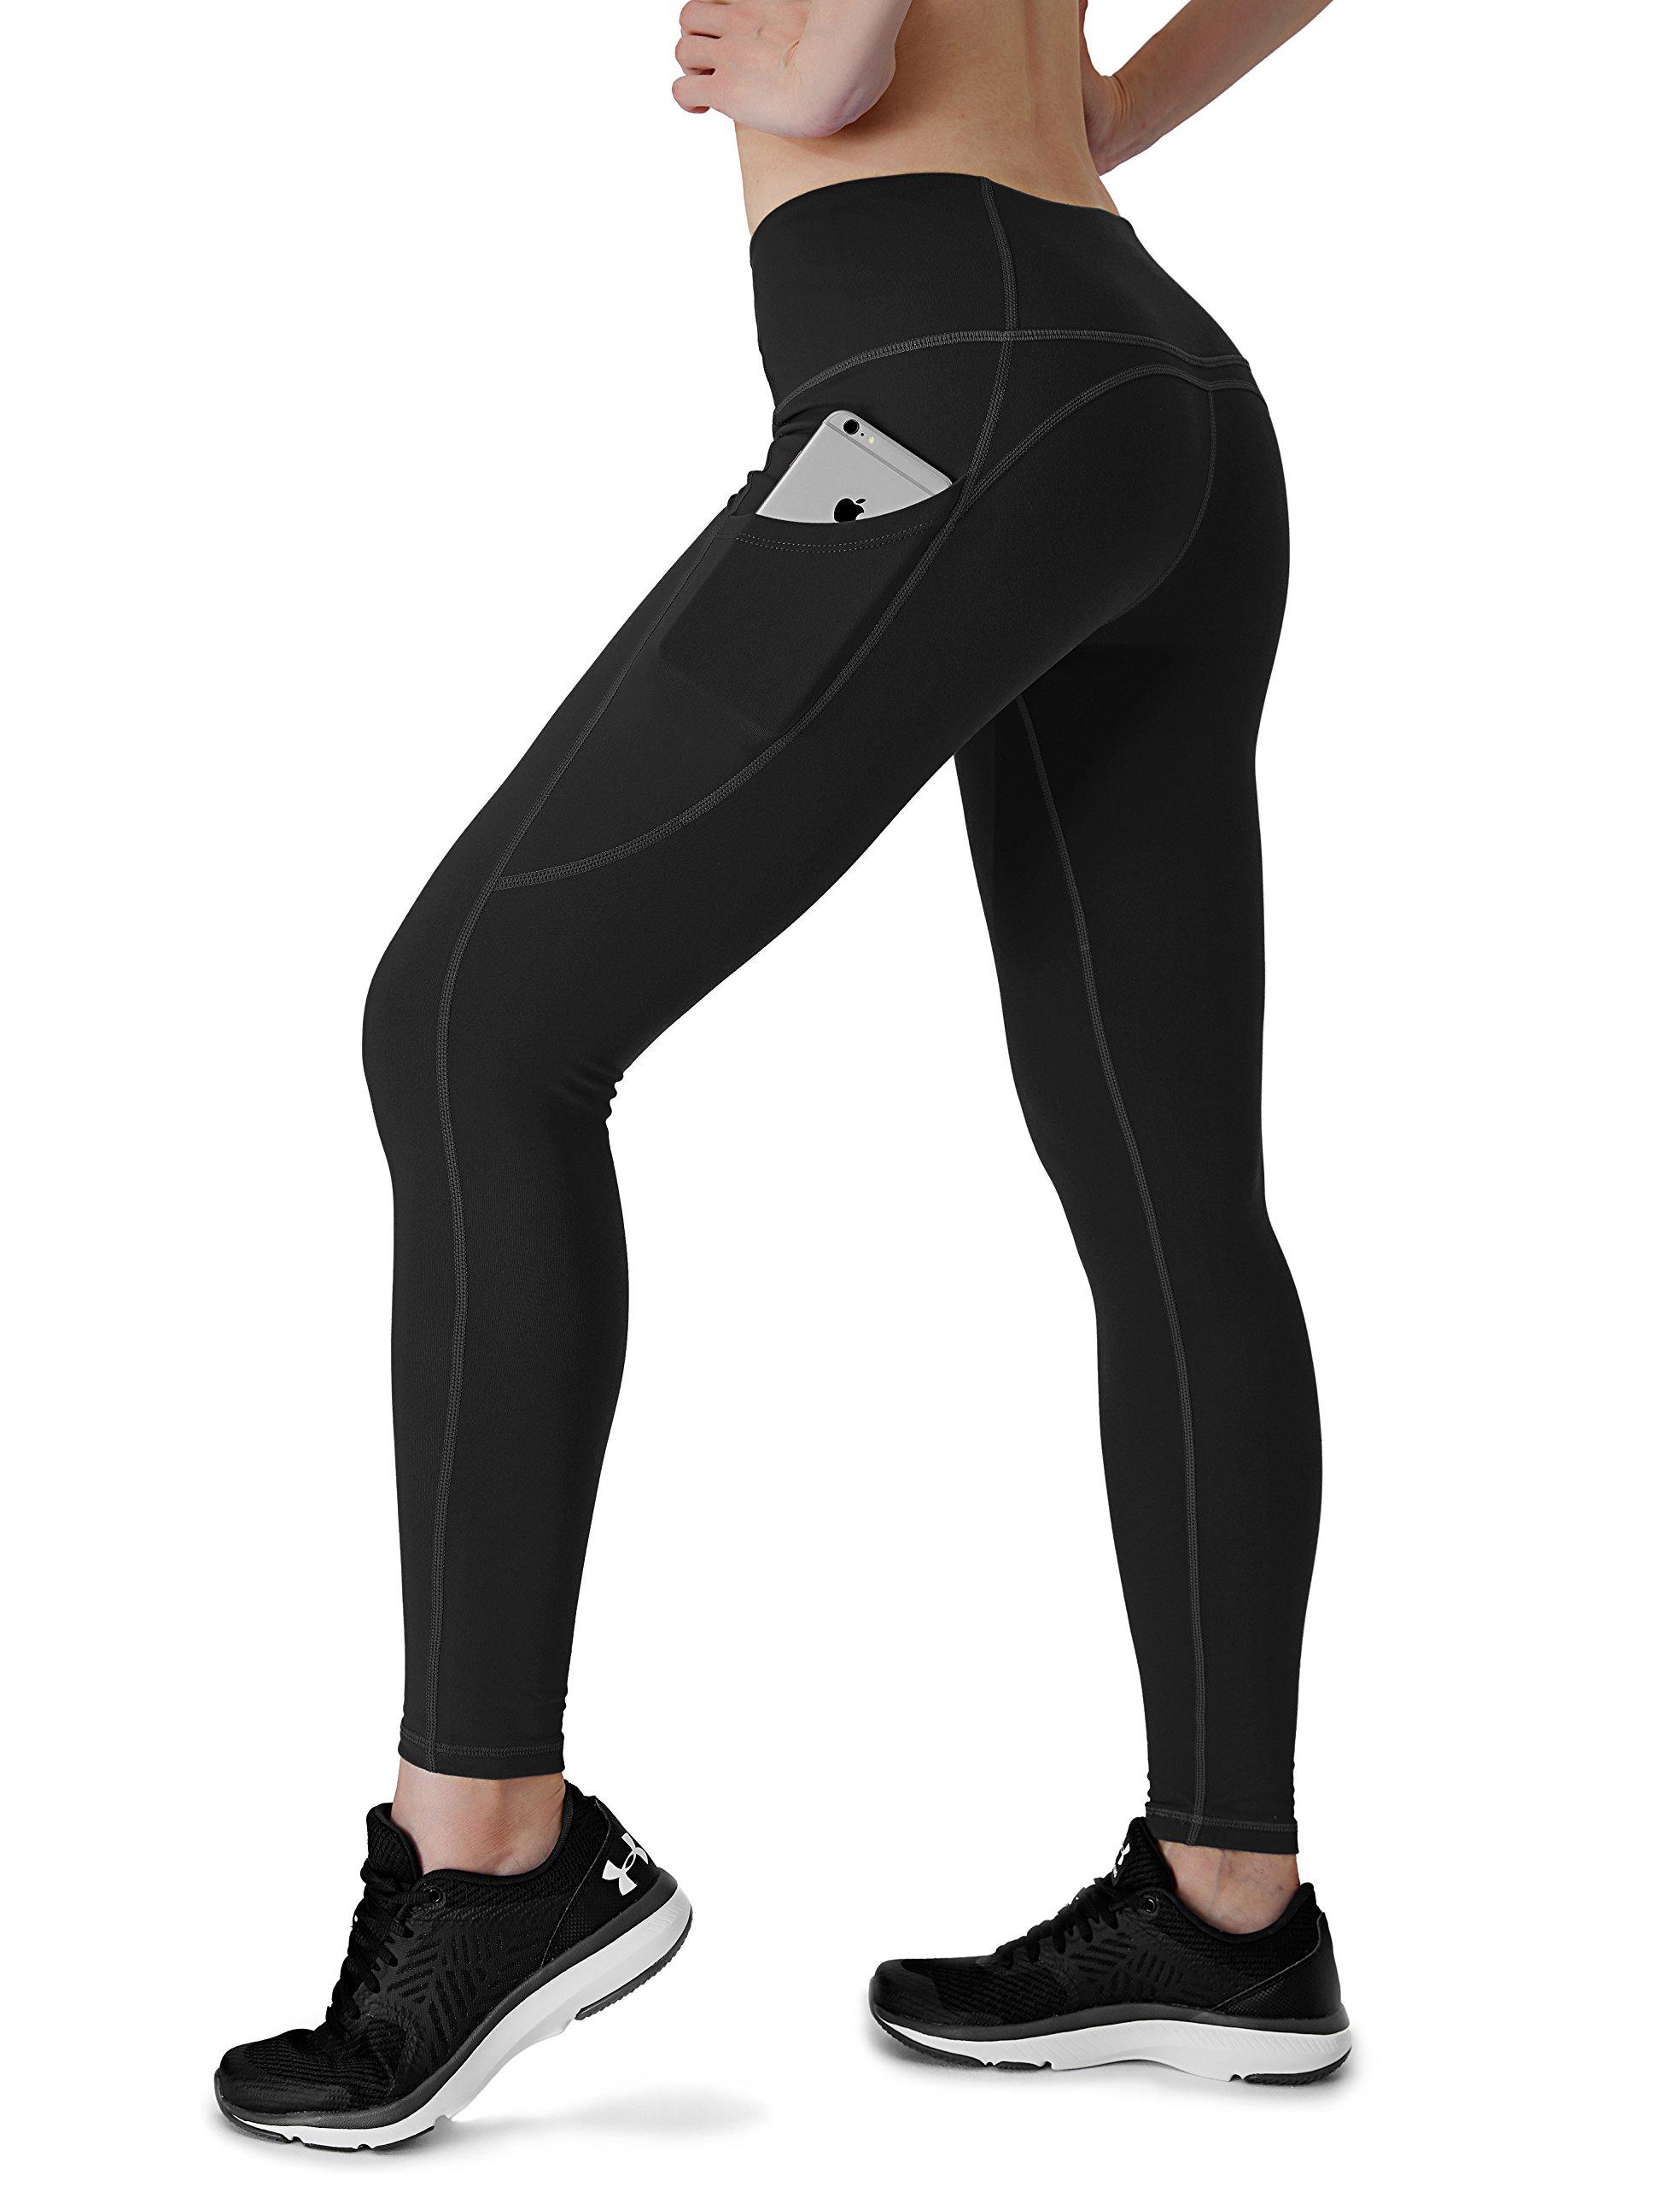 Dyorigin Leggings for Women – High-Waisted Tummy Control Compression Yoga Leggings Athletic Pants with Pockets (Black L)